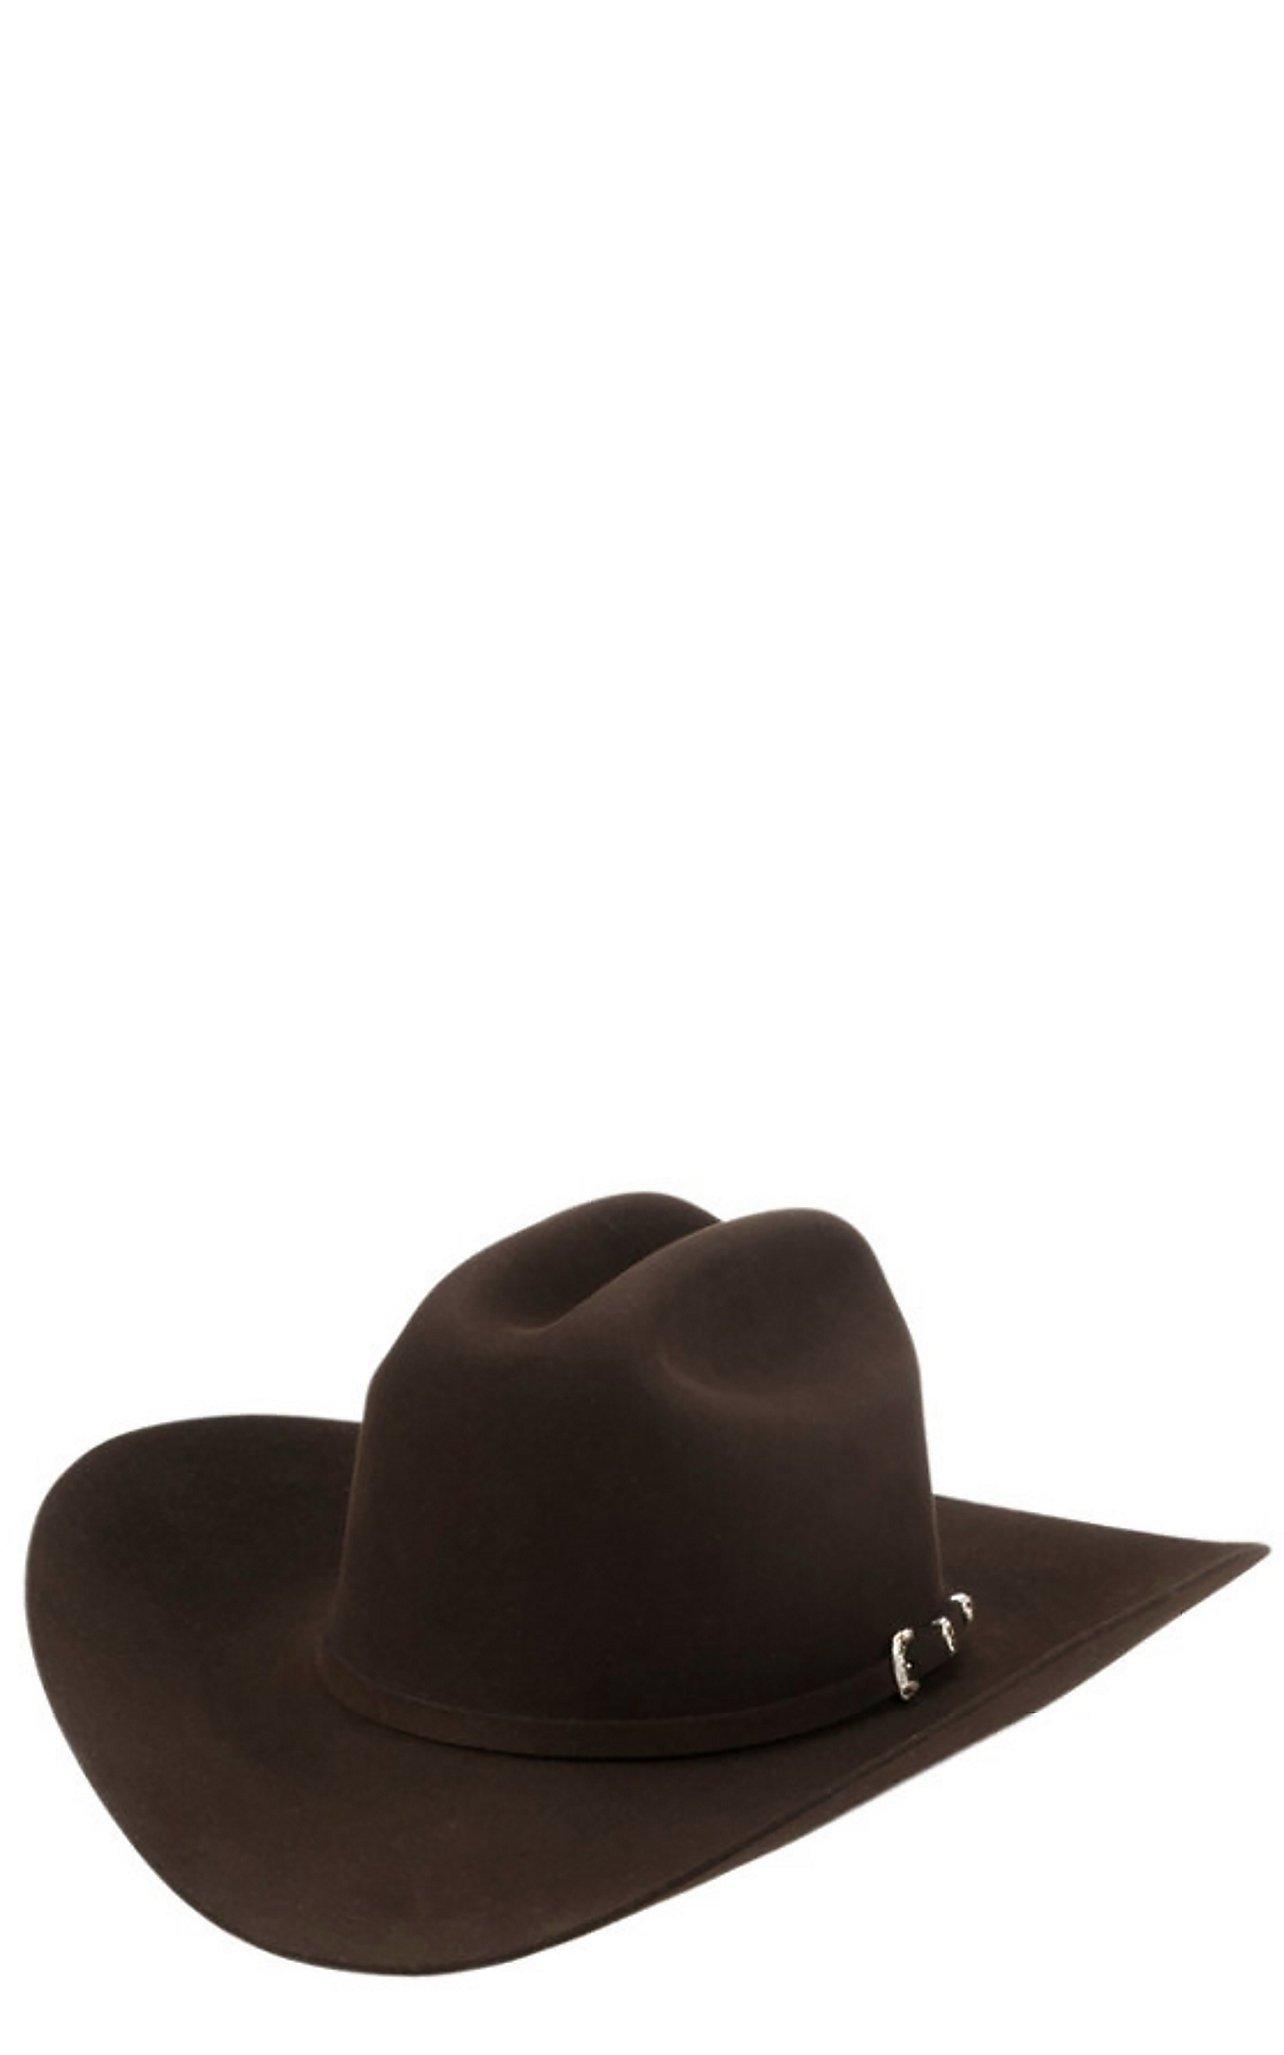 Stetson 30X El Patron Mocha Felt Cowboy Hat c3a88a86379